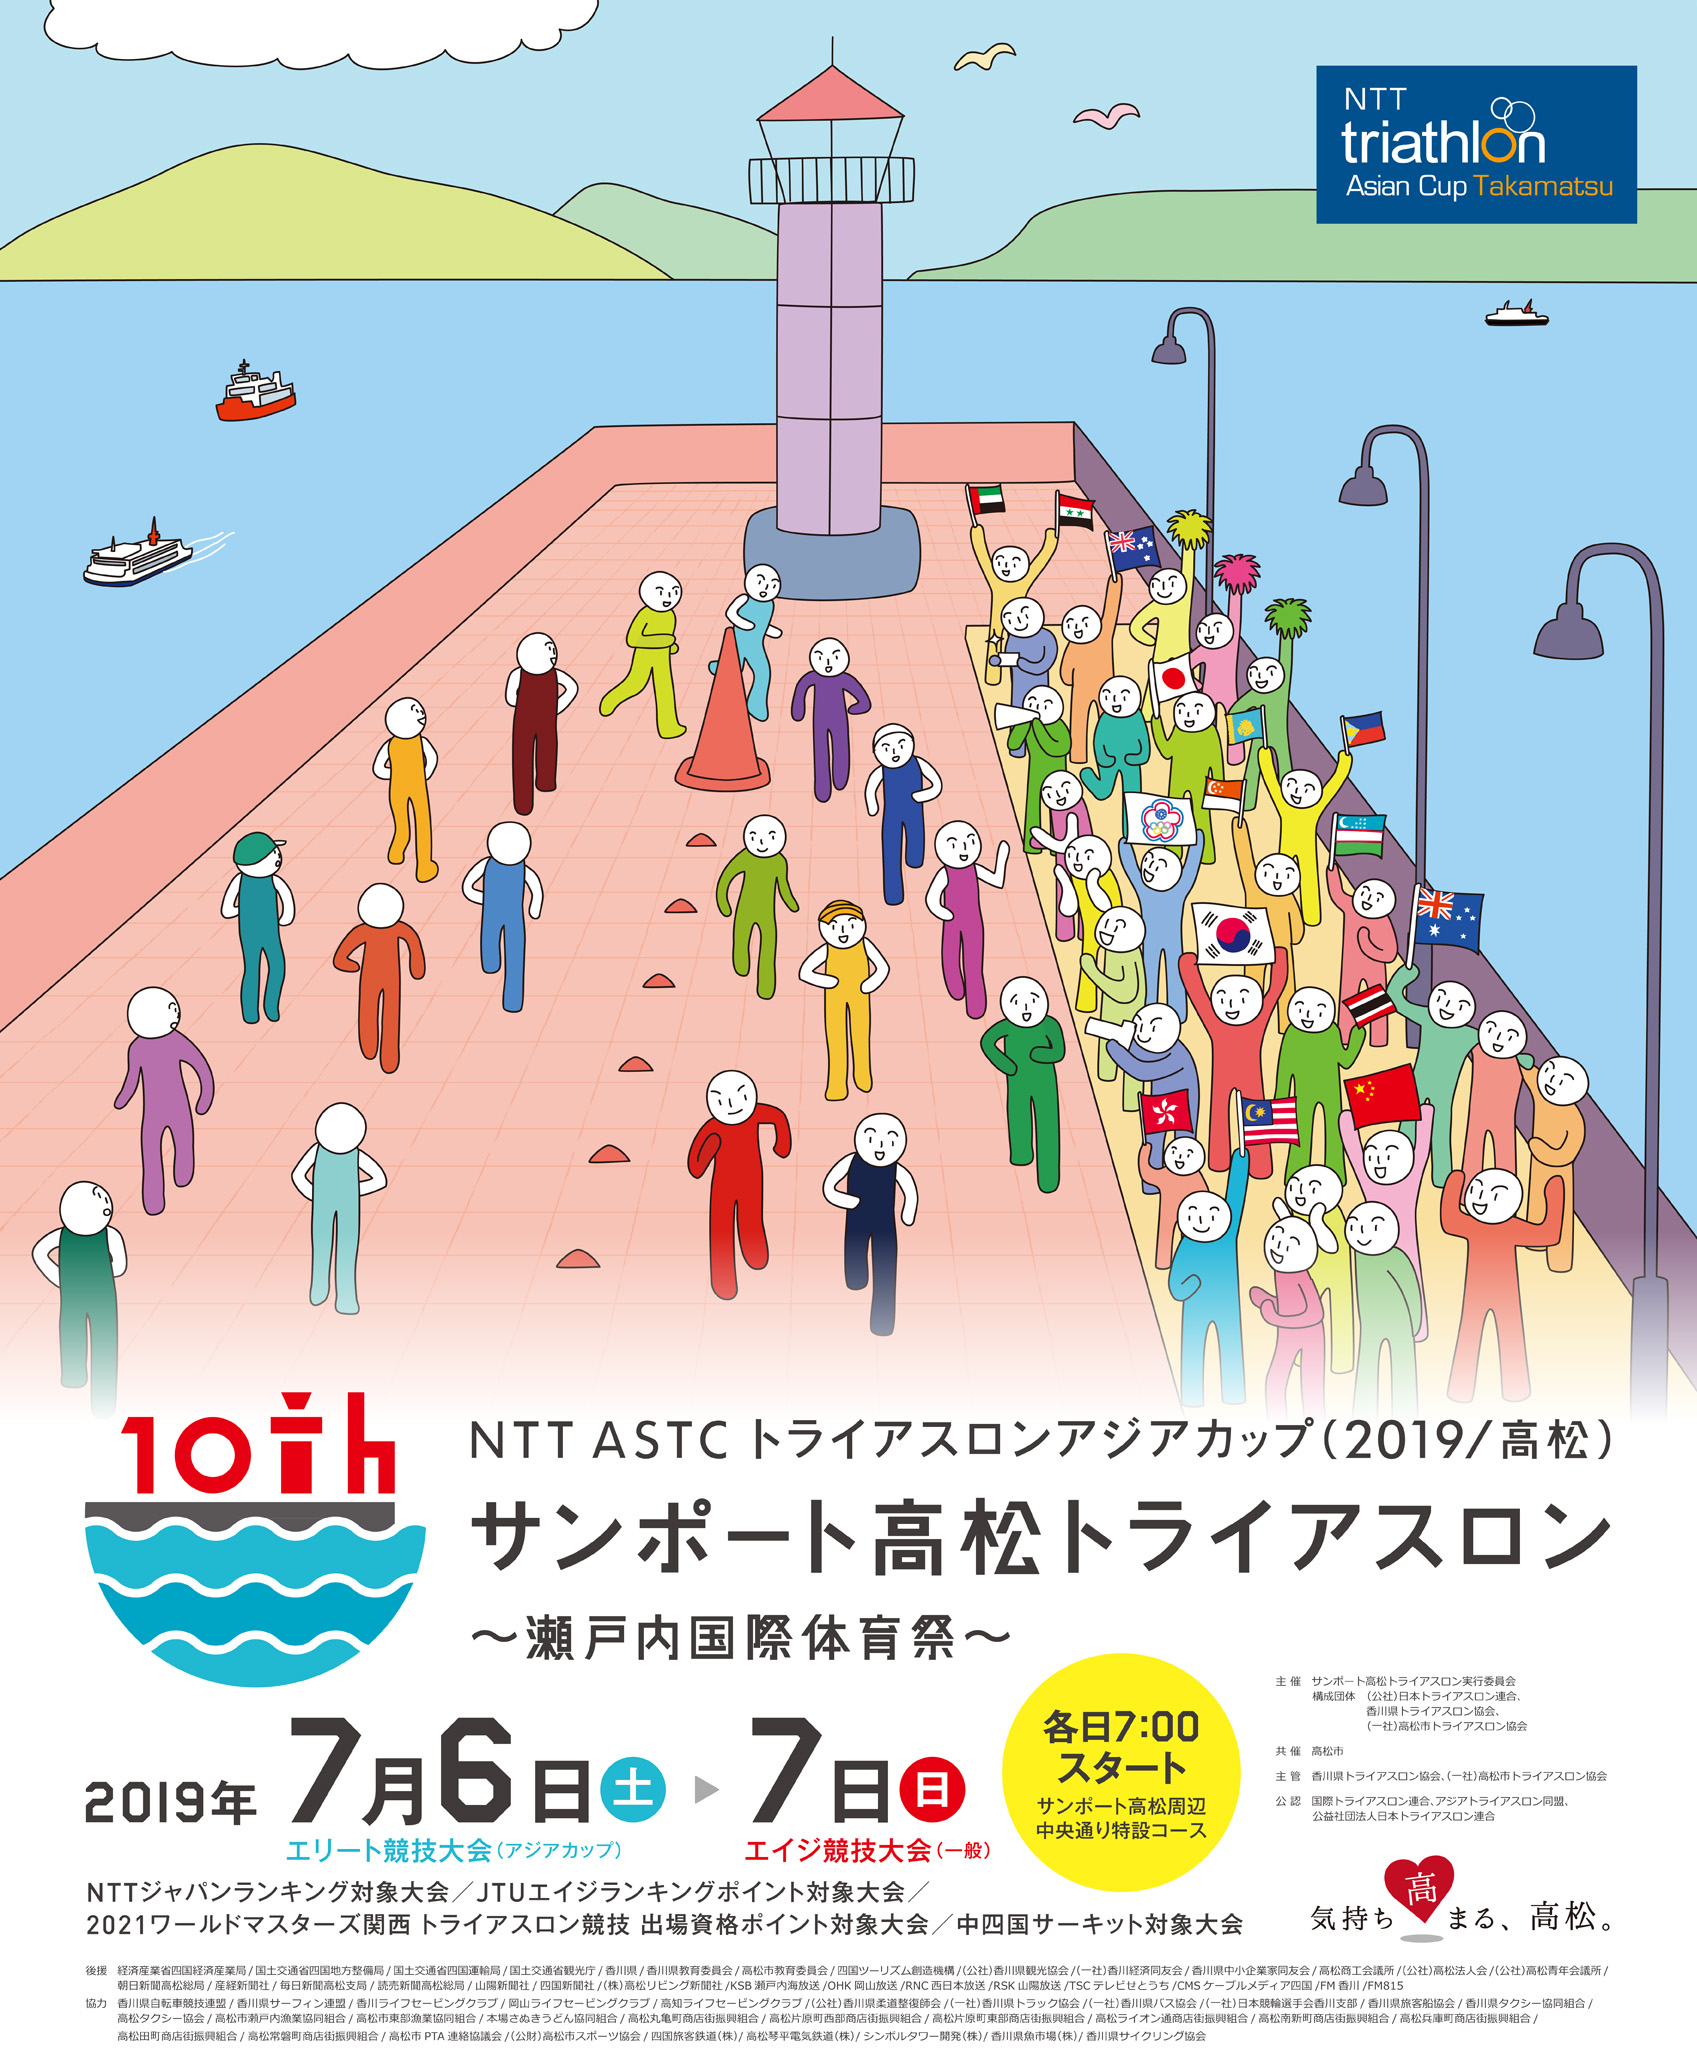 triathlon2019_本番A1poster_入稿